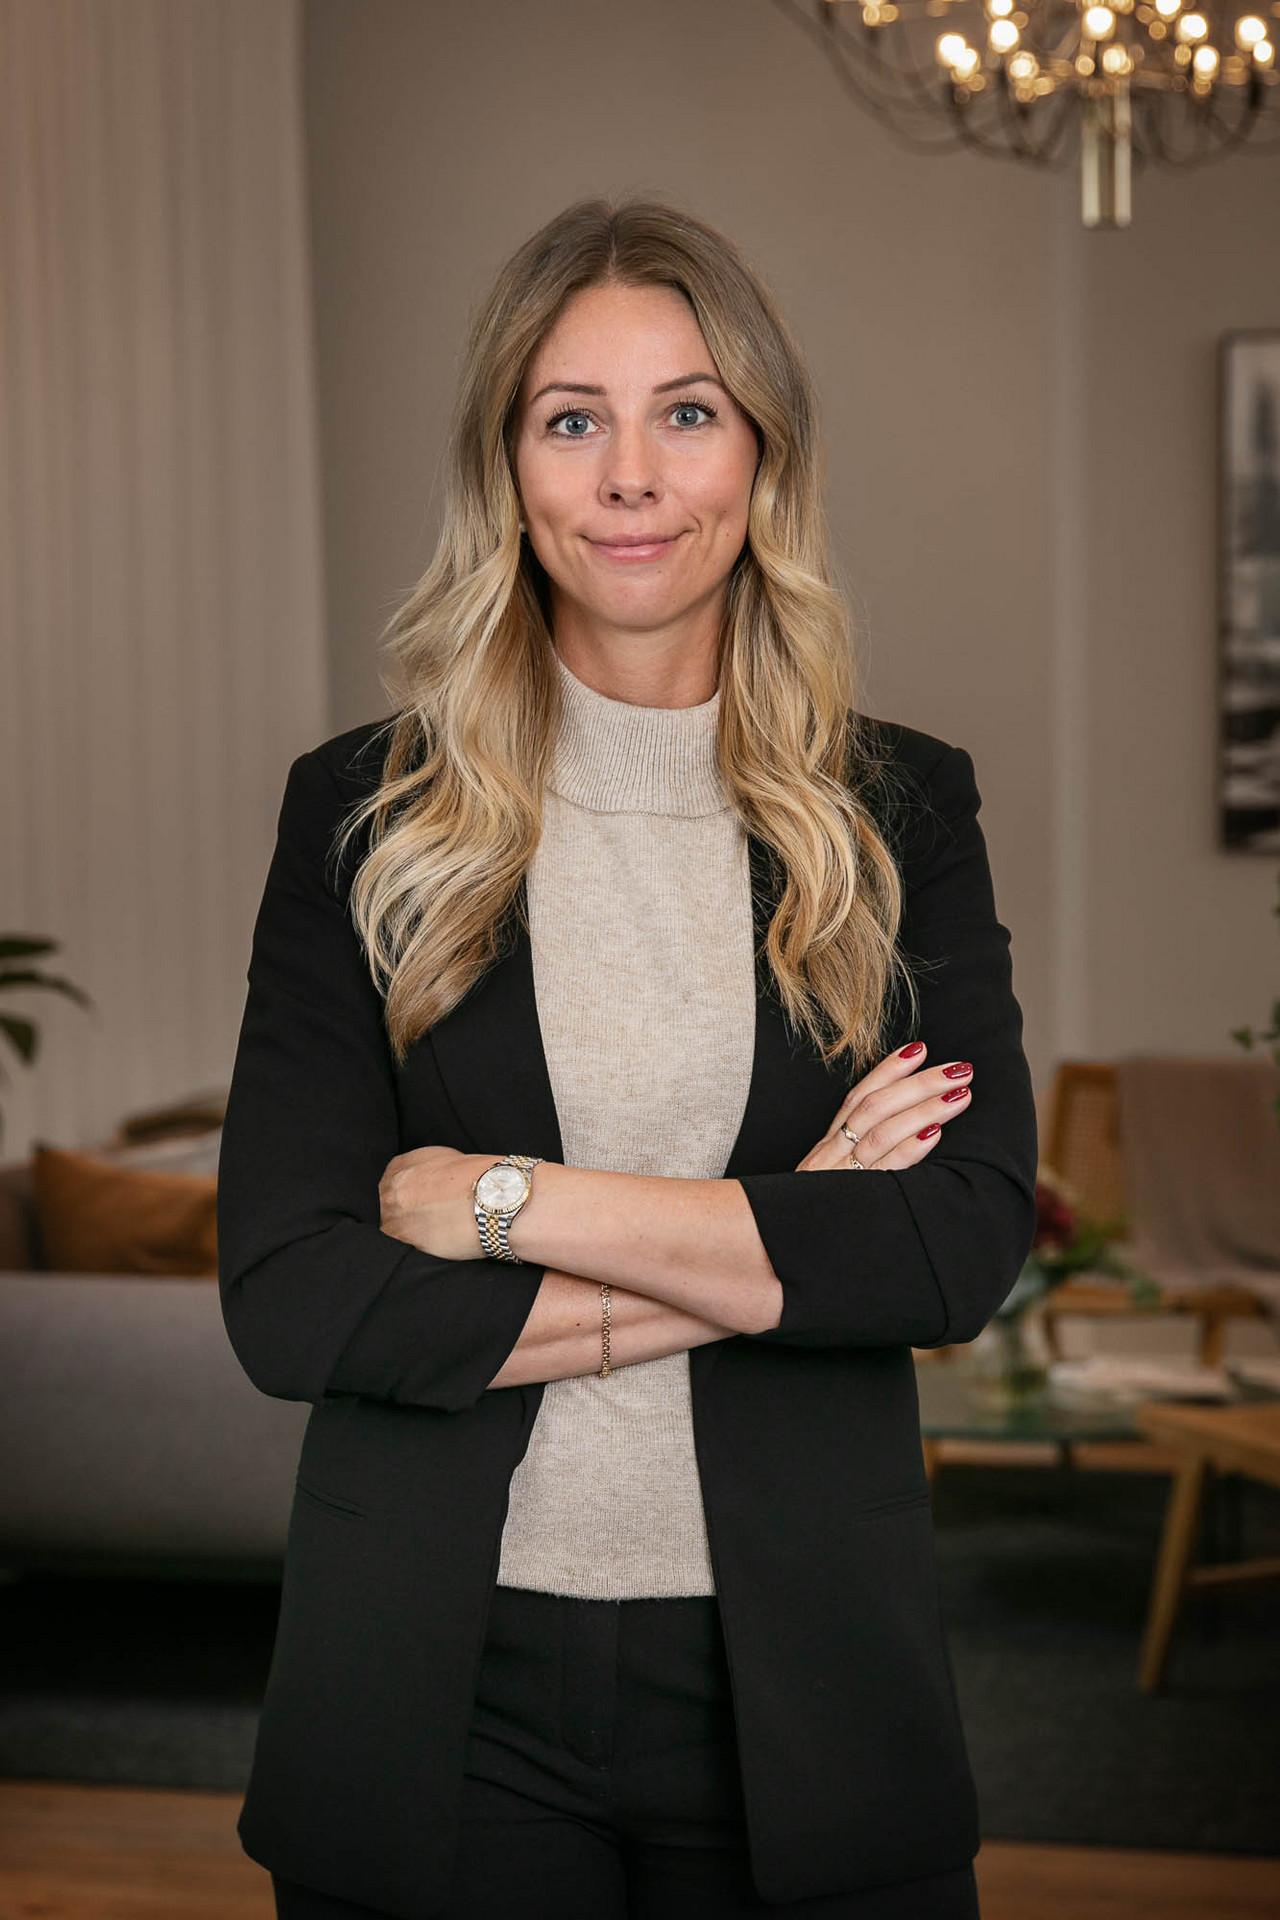 Sofie Vikström